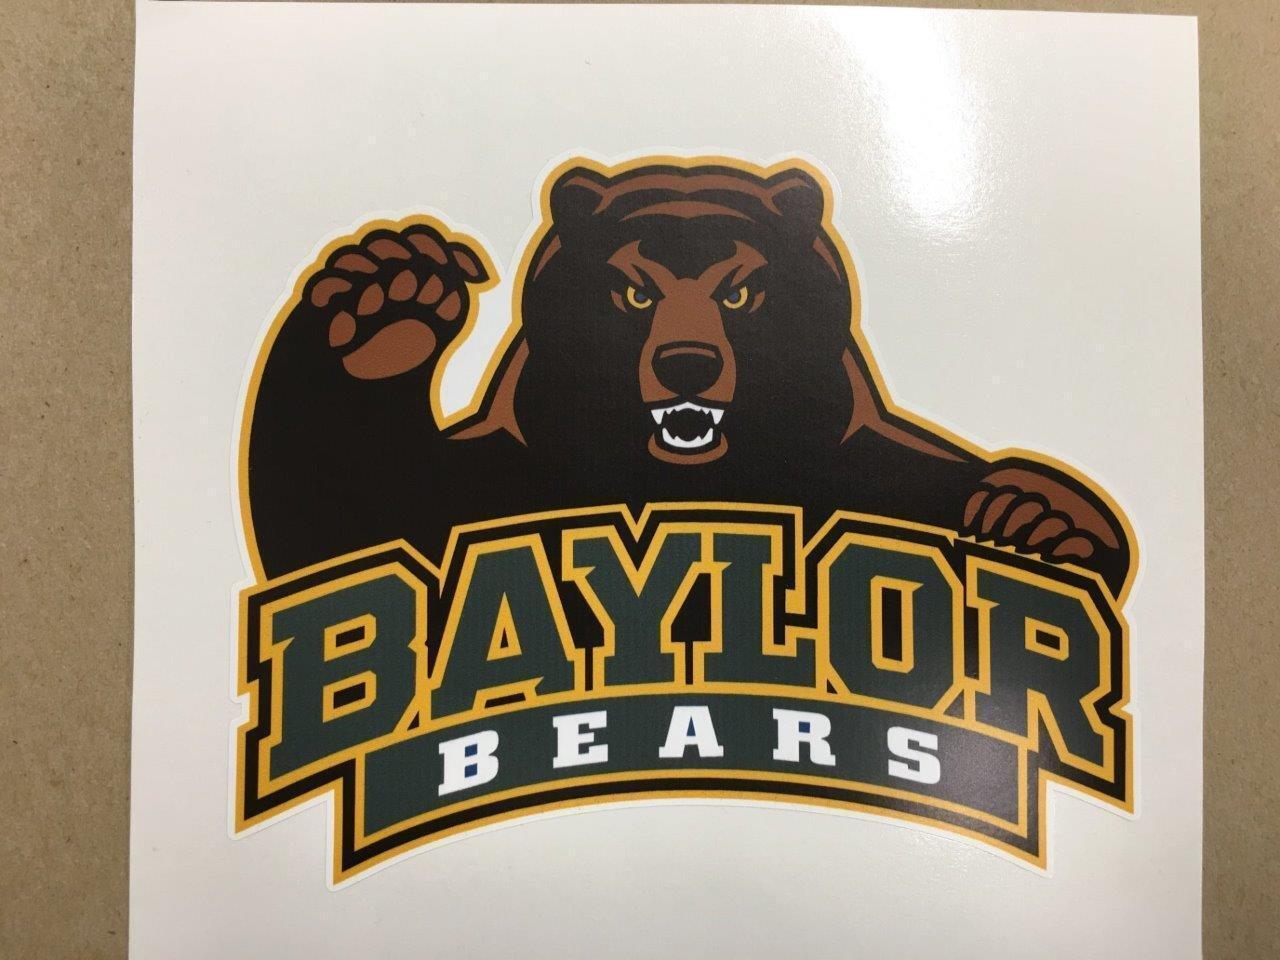 Baylor Bears cornhole board or vehicle decal(s)BB1